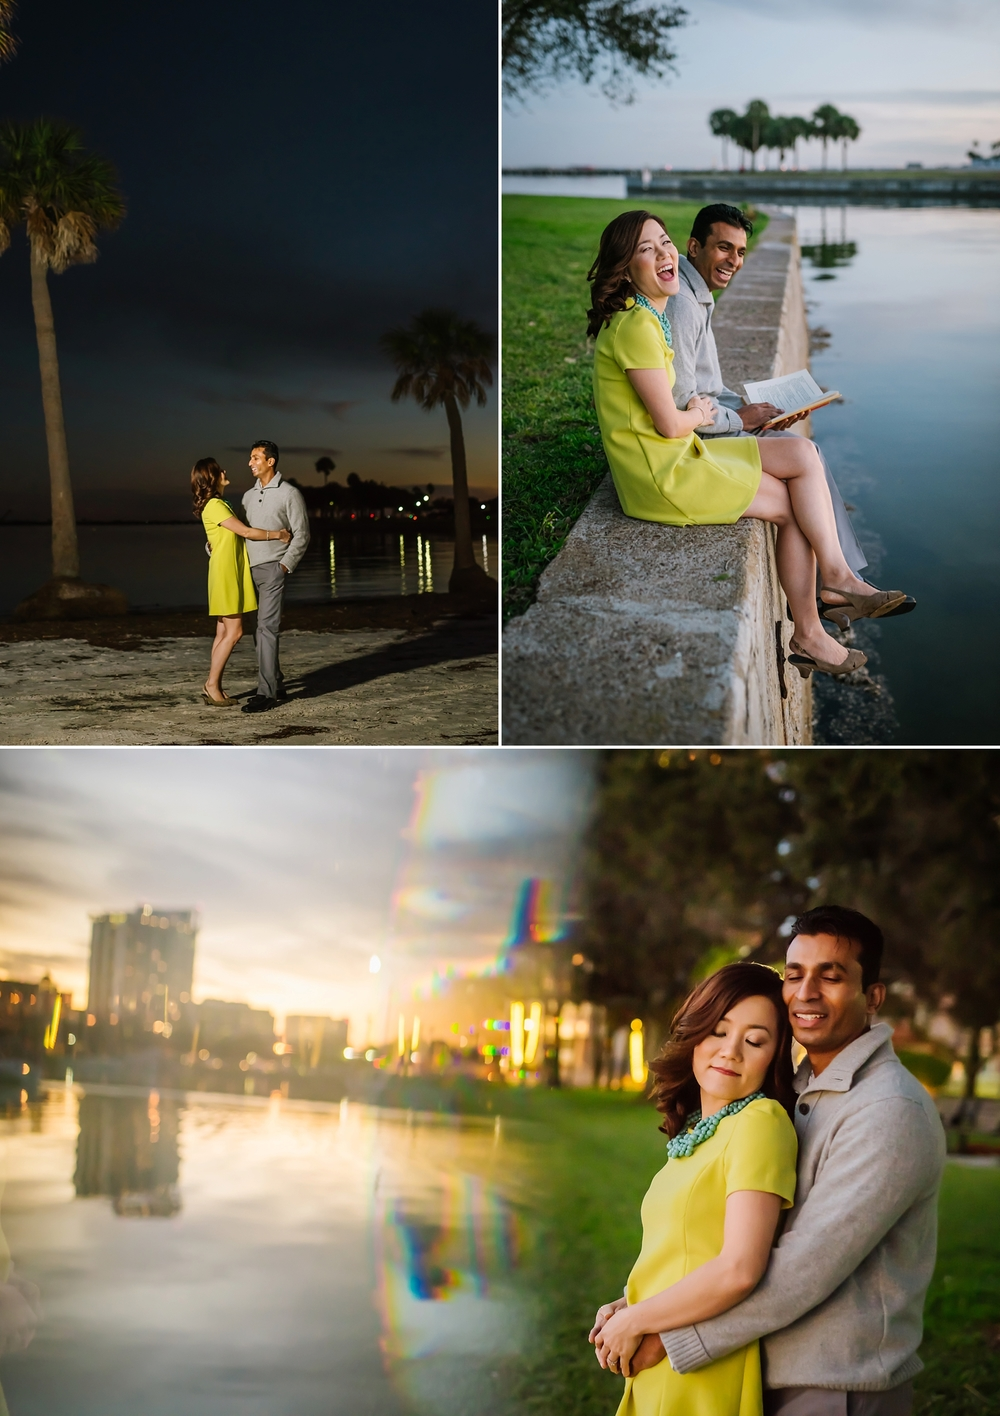 st-pete-marina-engagement-photography_0007.jpg